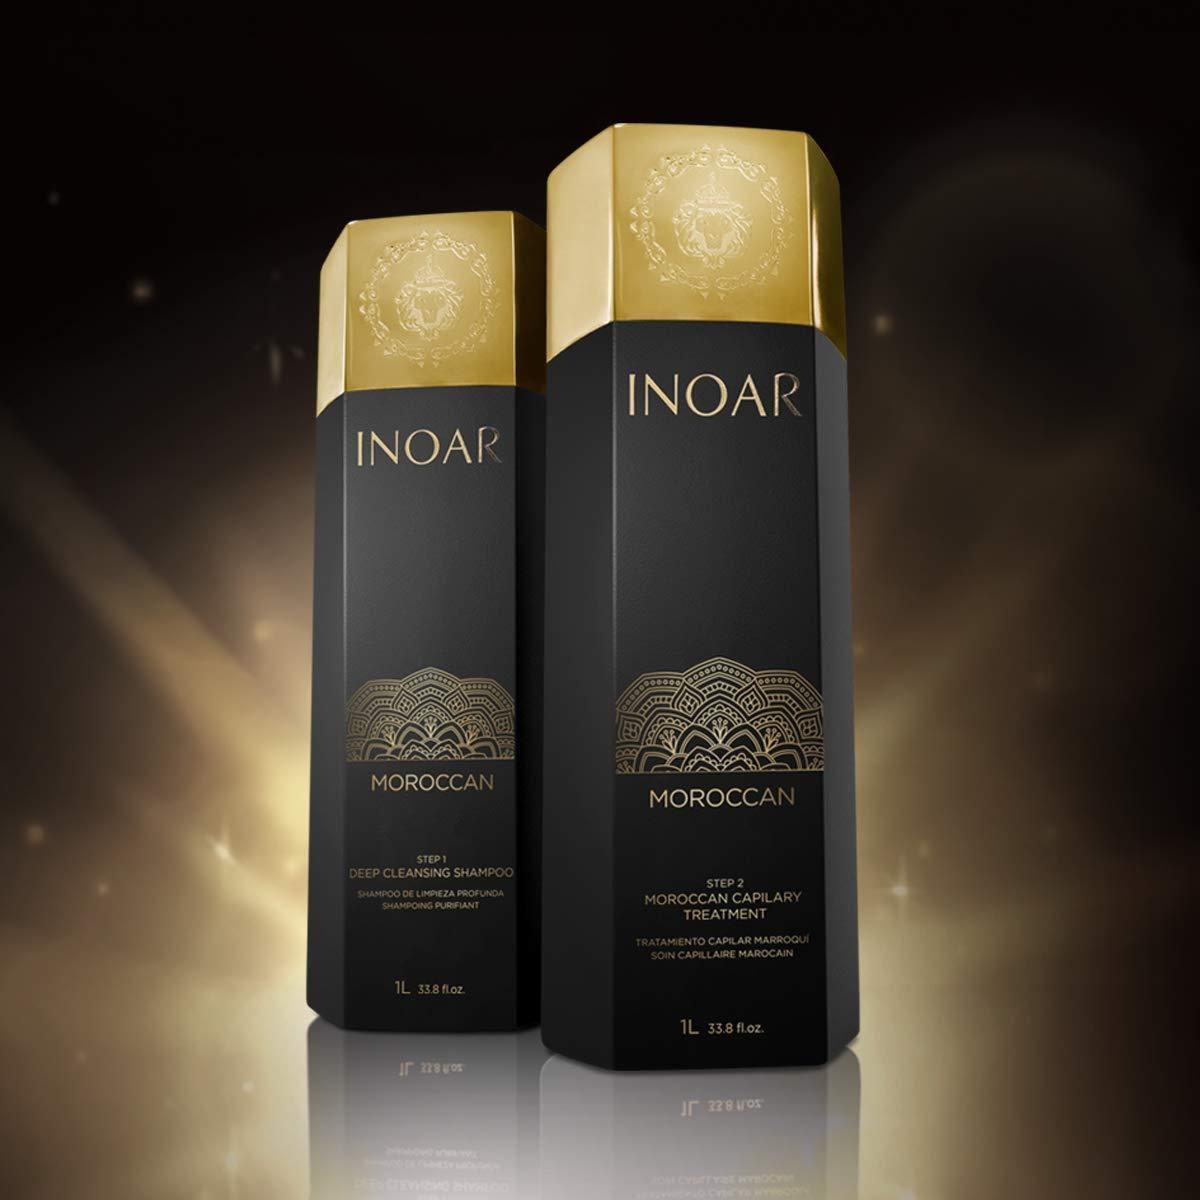 Inoar Moroccan Brazilian Keratin Hair Straightener Treatment - Smoothing Capillary, 33oz Set